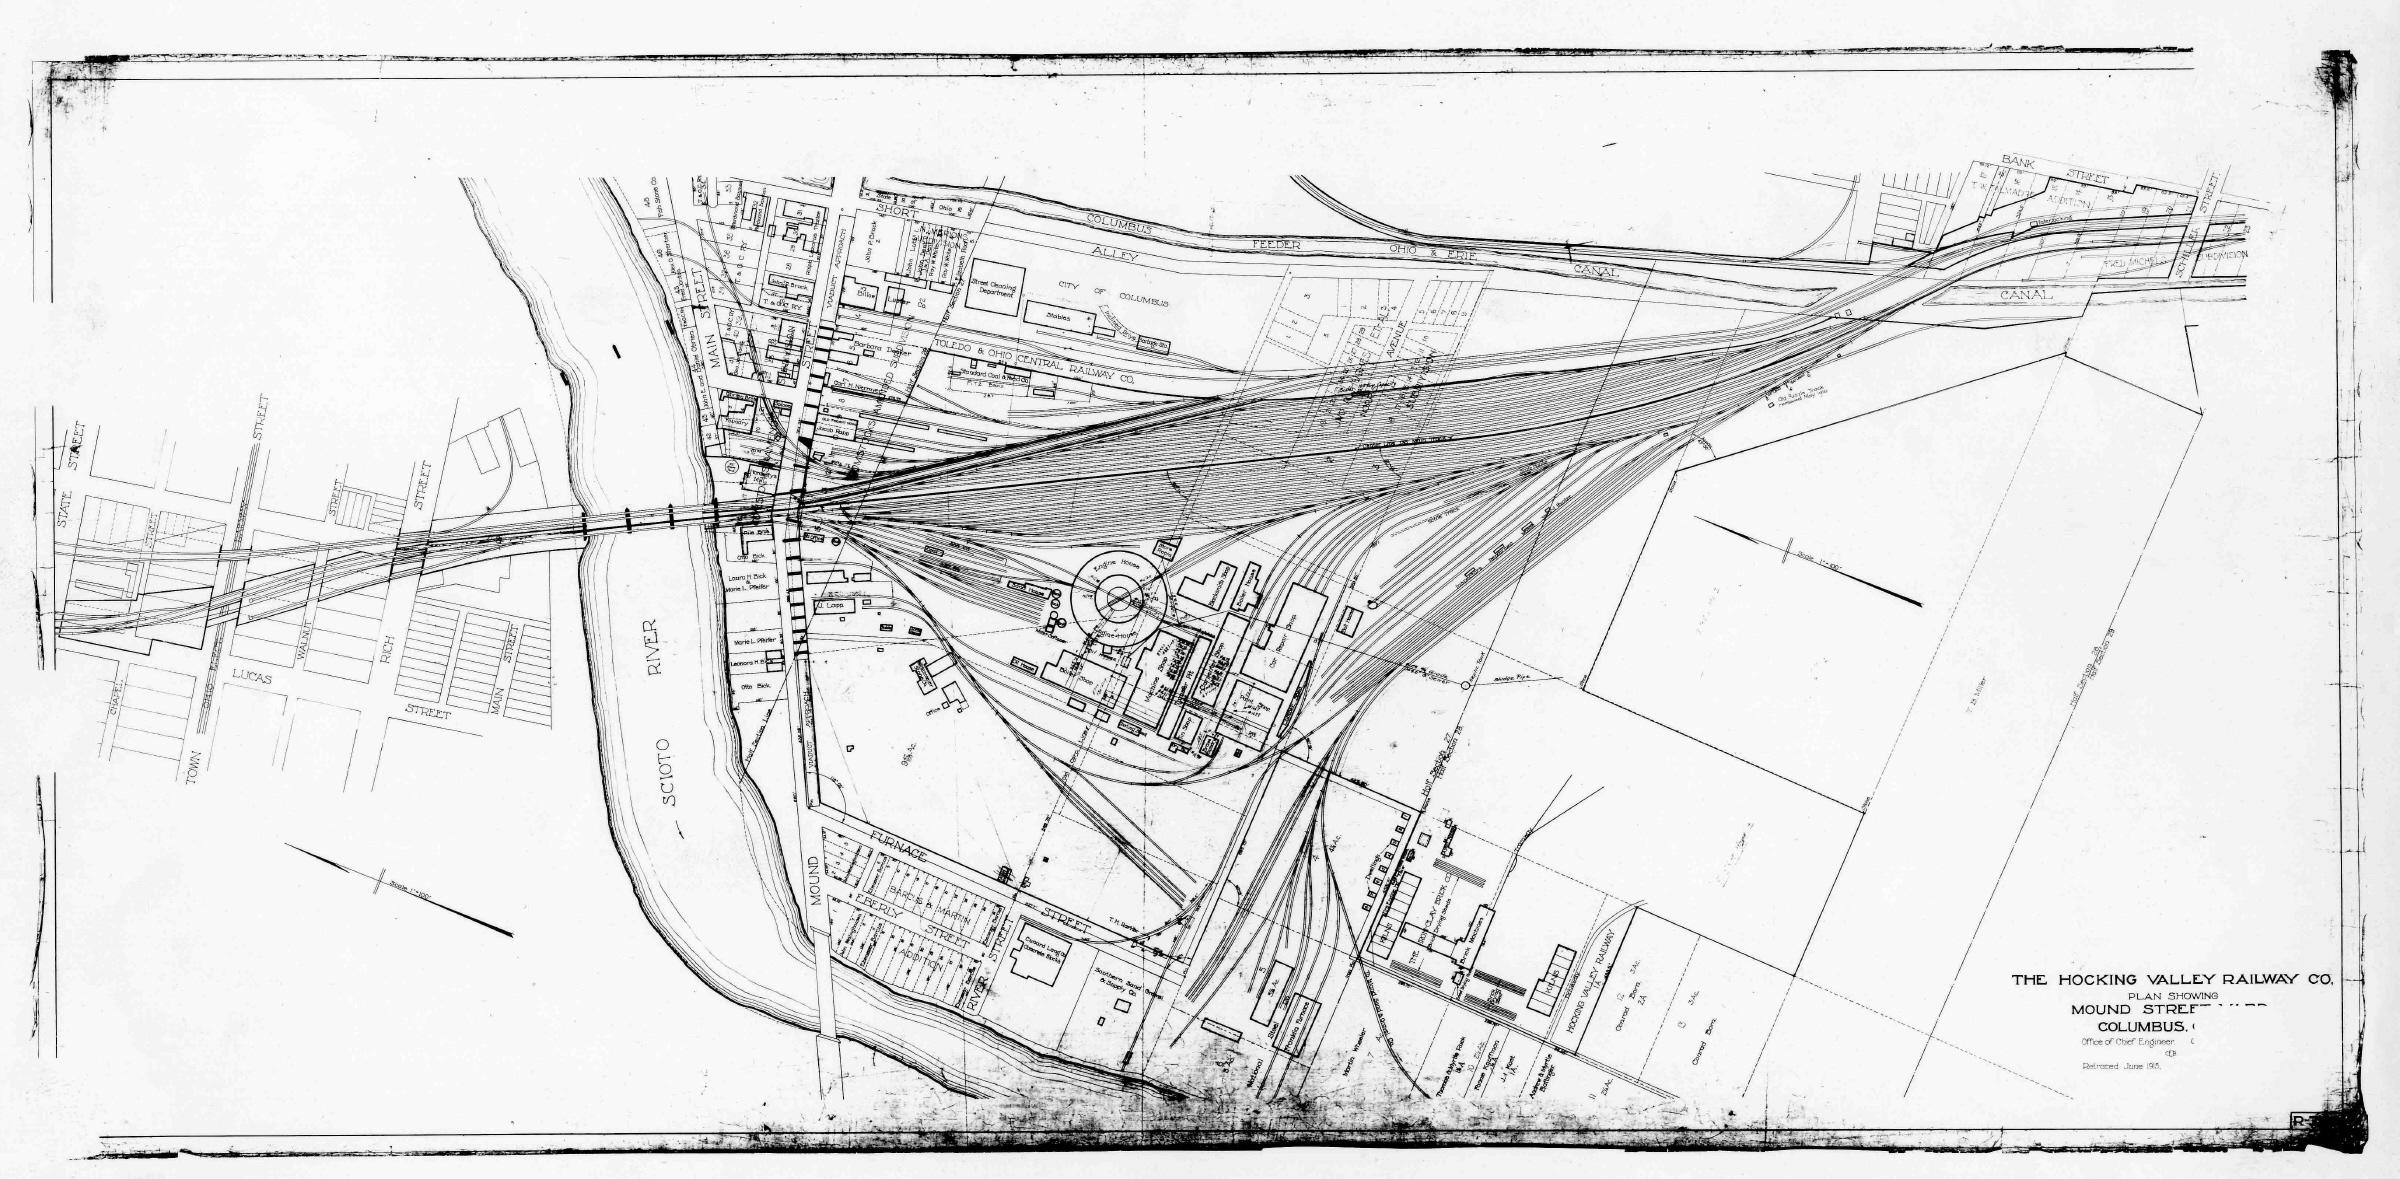 Map_Mound_Street_Yard786-2400 Railroad Yard Schematic Diagrams on computer circuit board, samsung lcd tv, am tube radio, sony tv, digital multimeter, hvac system,